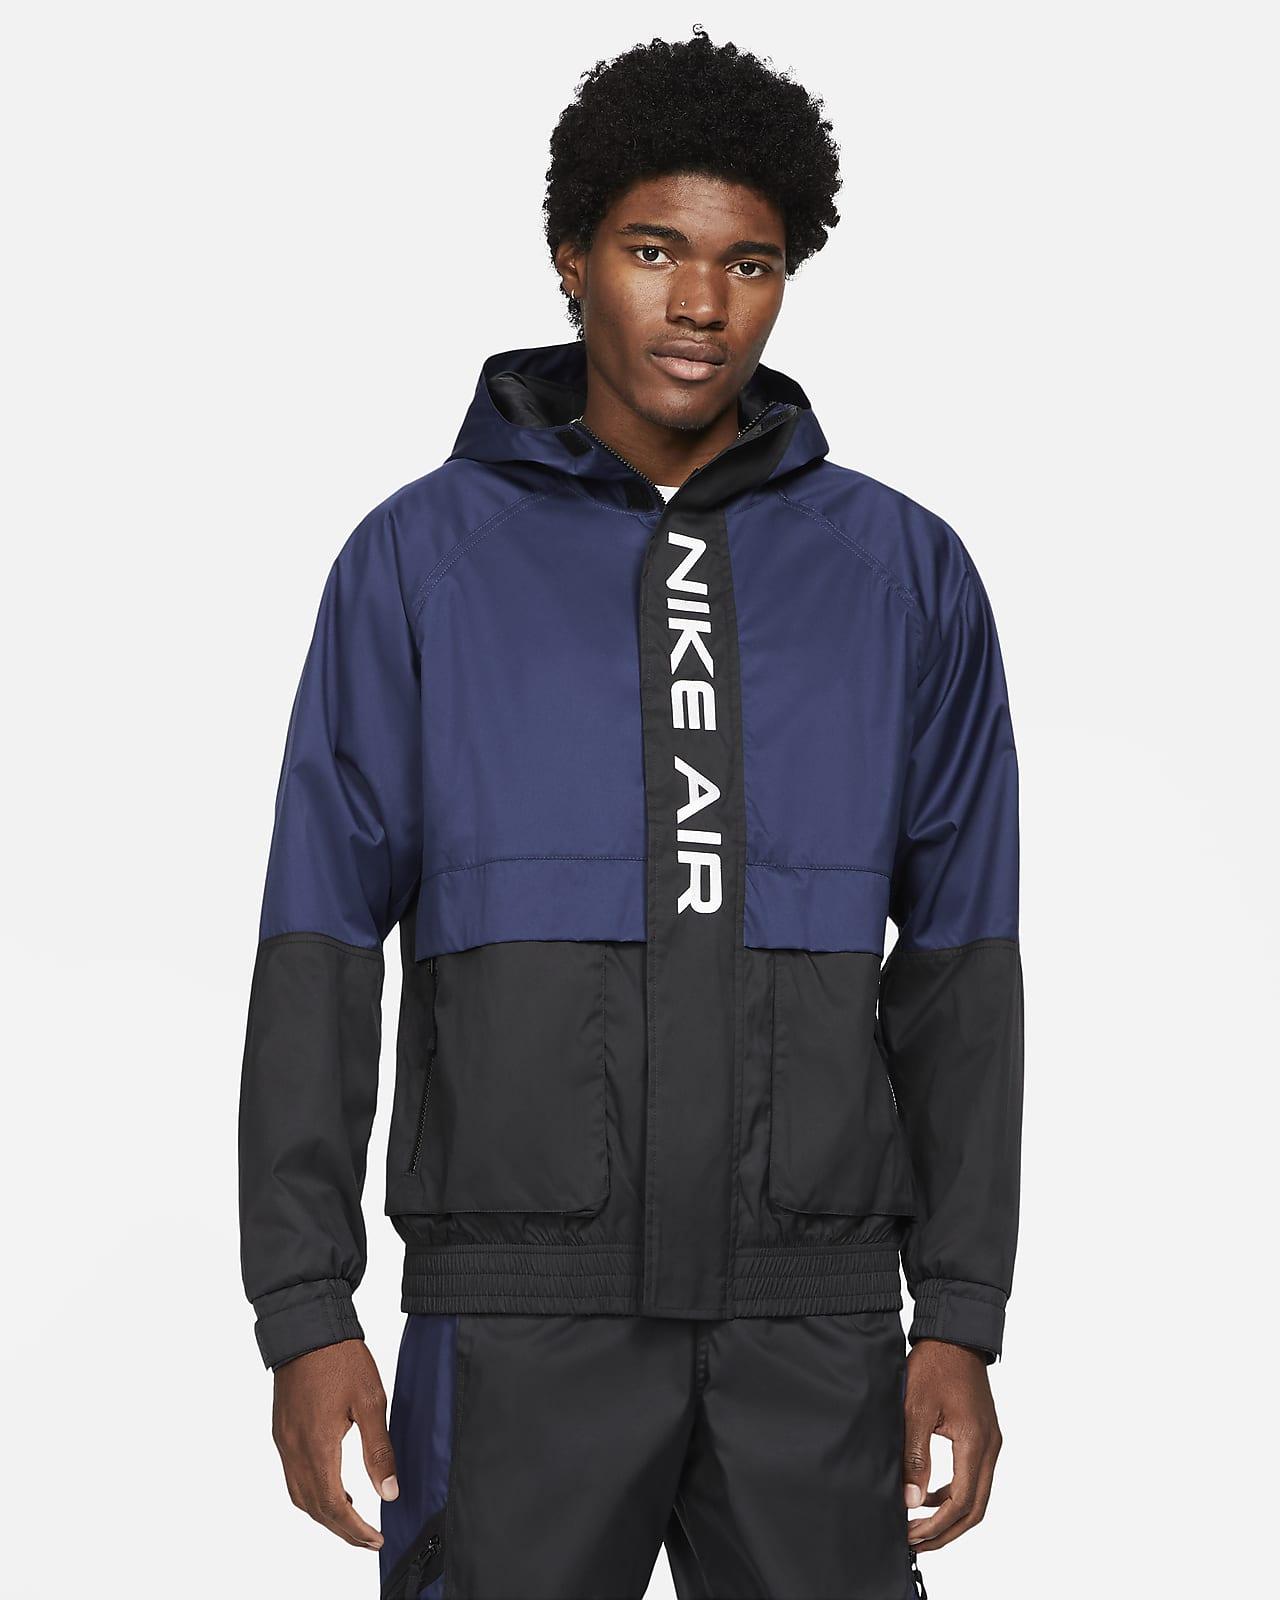 Nike Air Men's Hooded Lined Jacket